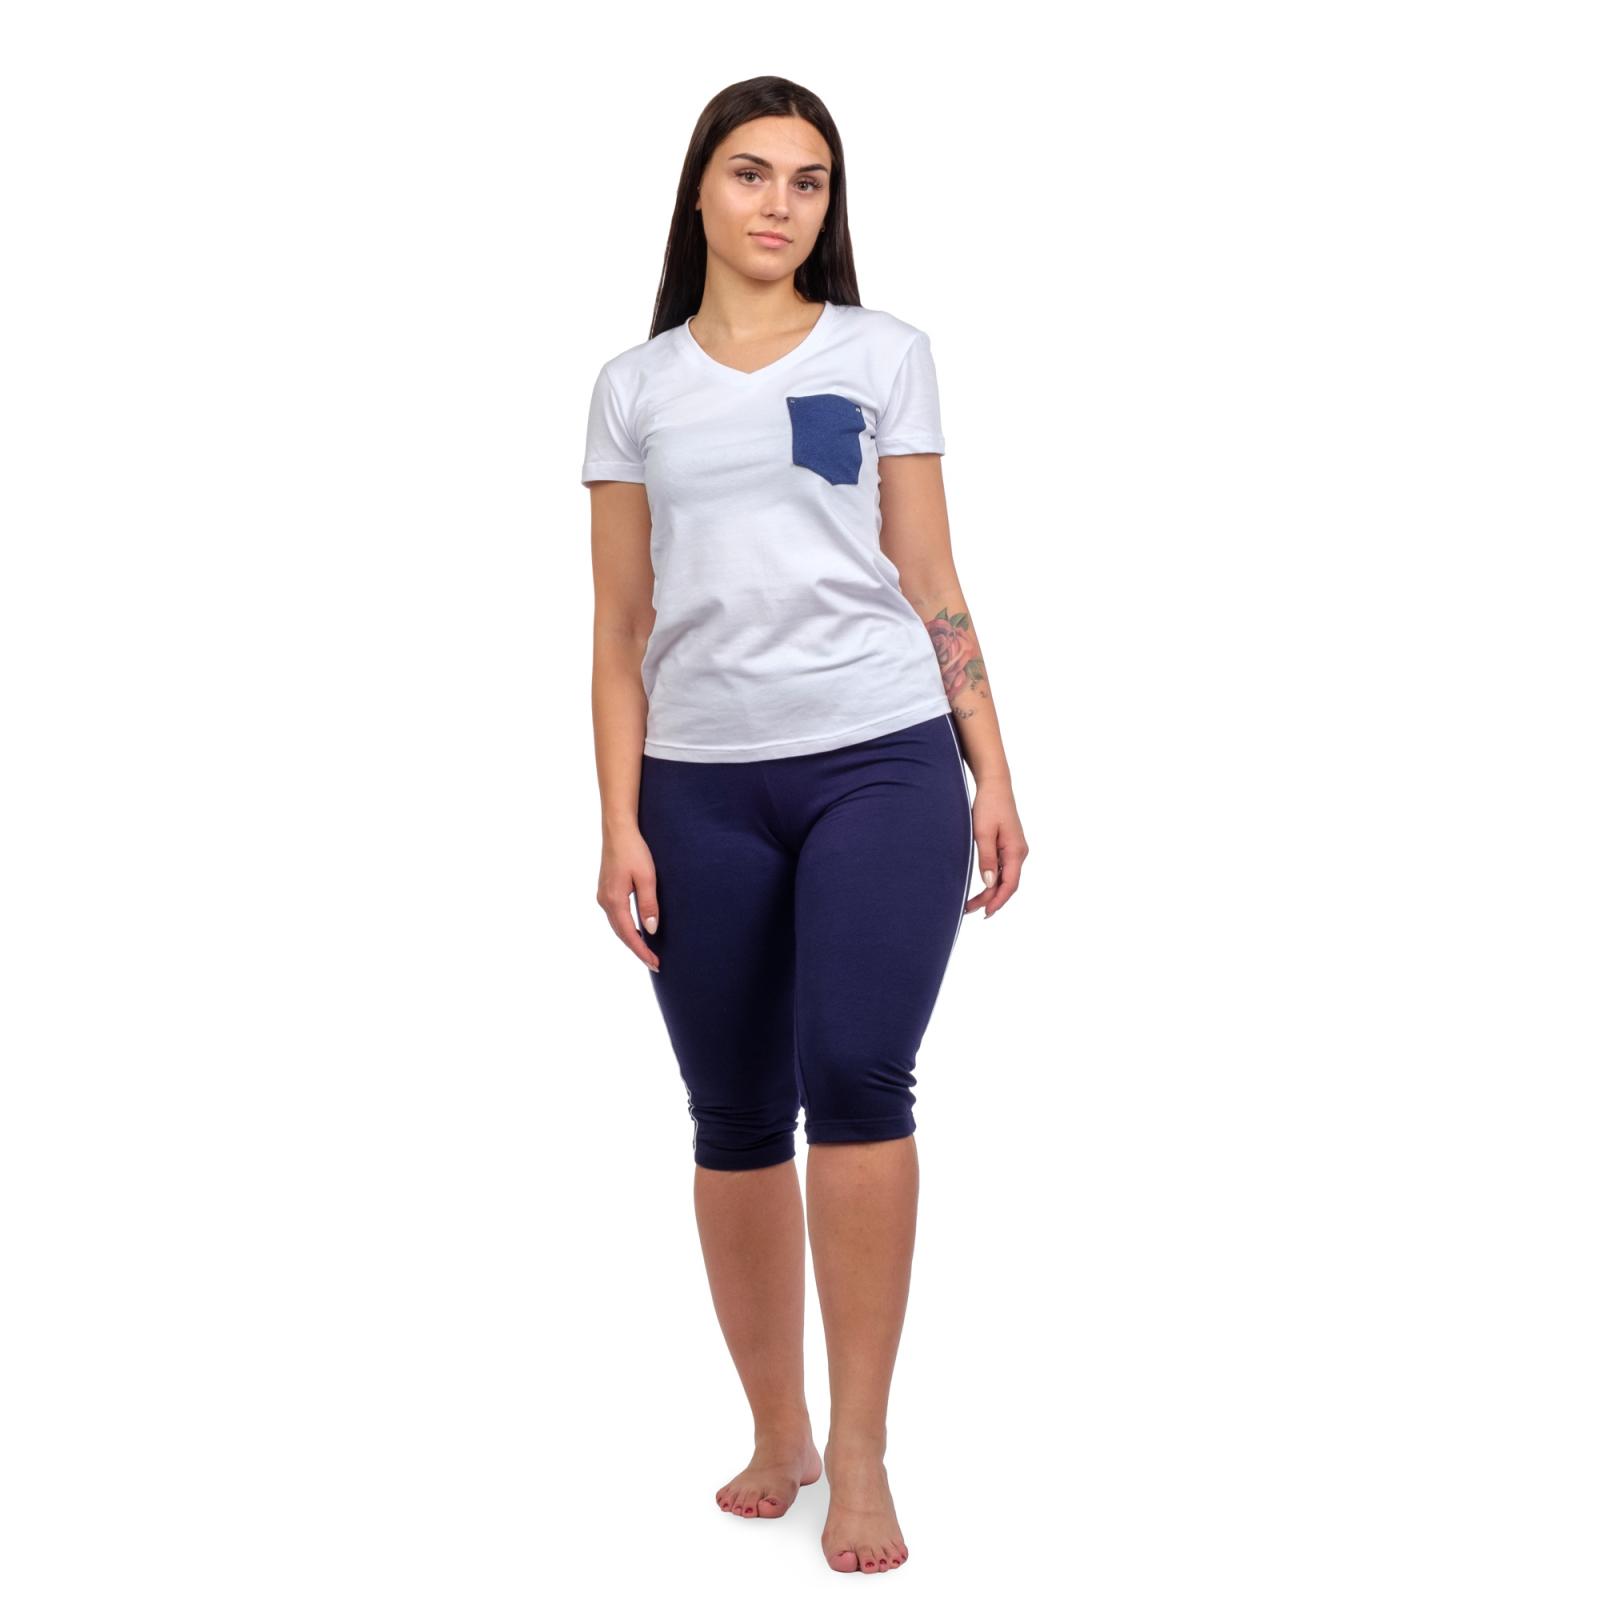 Футболка белая (карман - джинса) М-0126Б